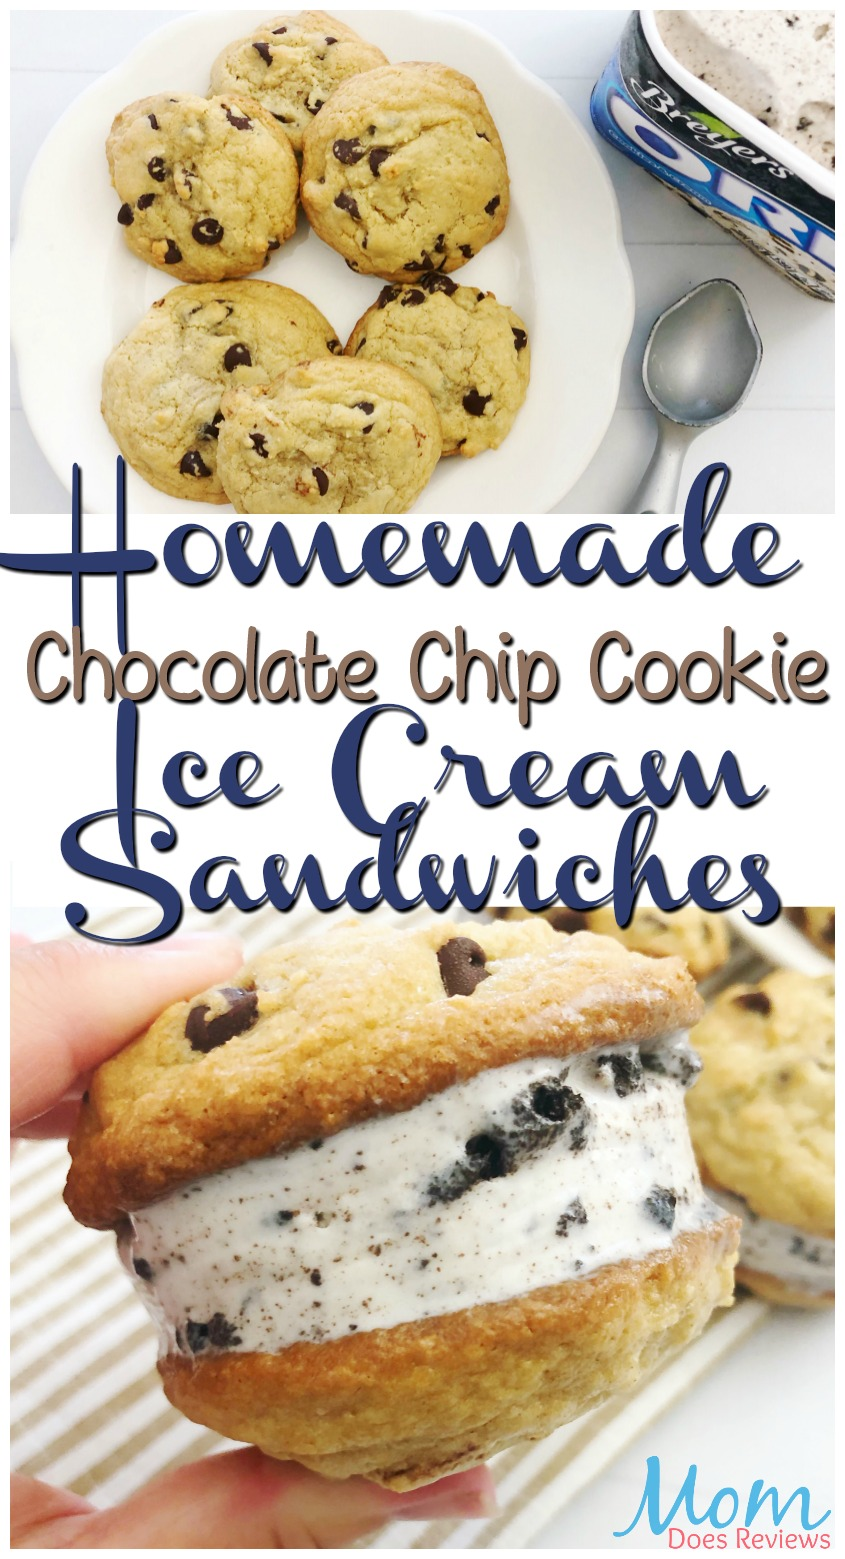 Homemade Chocolate Chip Cookie Ice Cream Sandwiches #dessert #icecream #cookies #chocolatechip #sweets #yummy